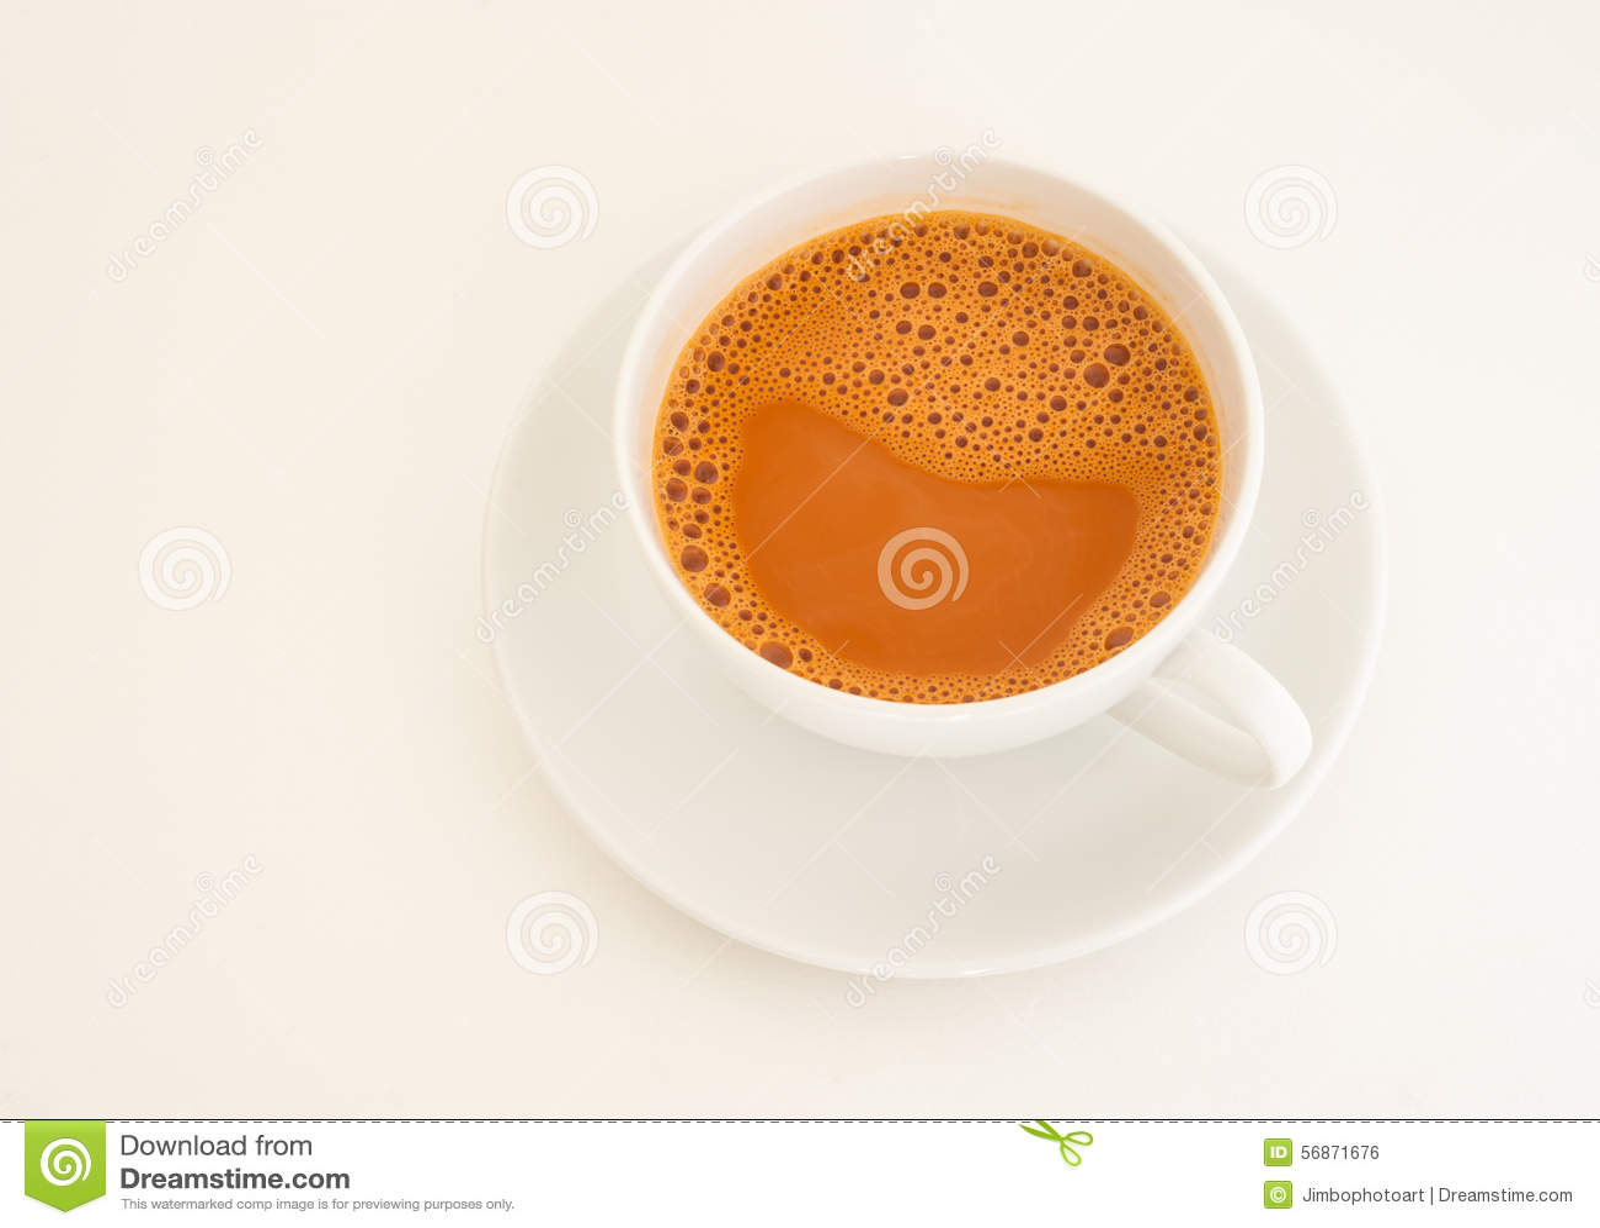 Hot Milk Tea In Cup Stock Photo - Image: 56871676